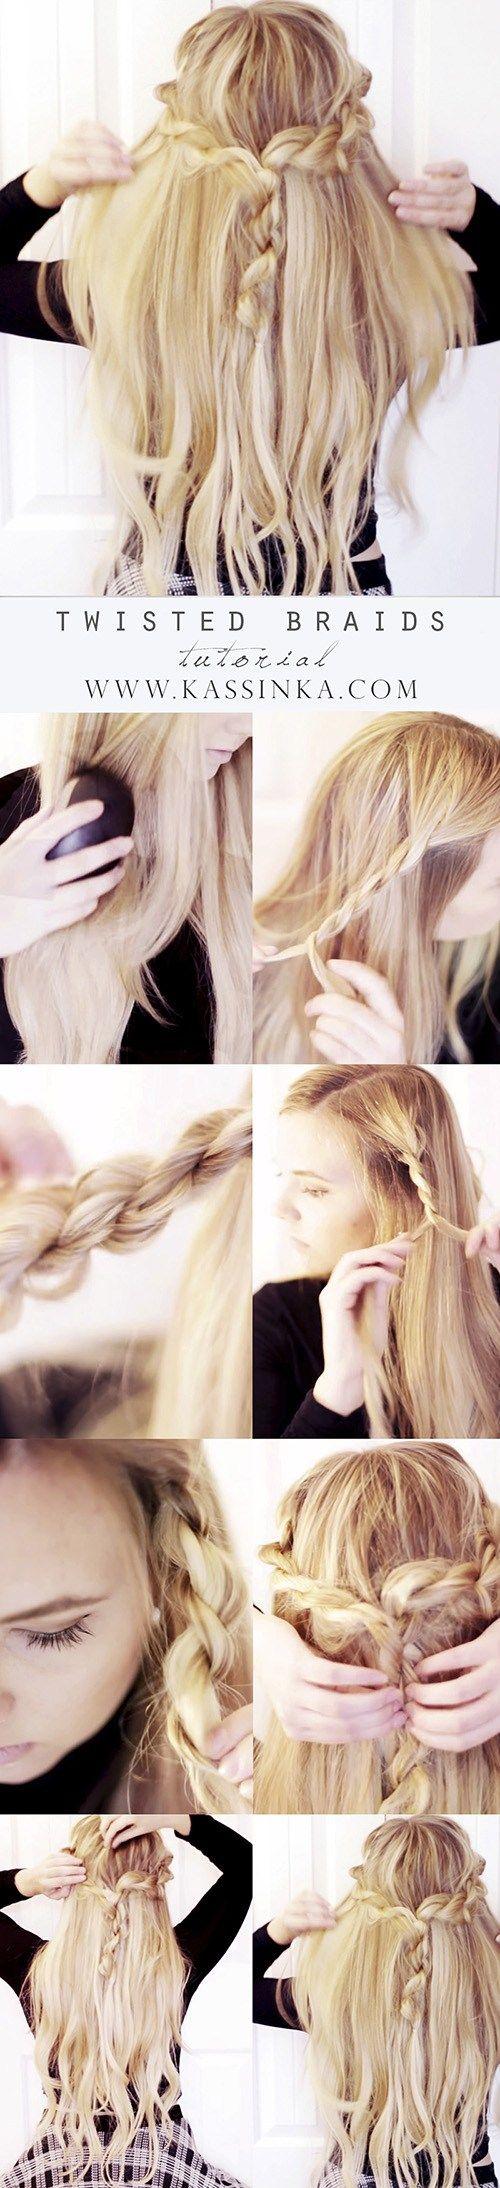 twisted-braids-hair-tutorial-kassinka3